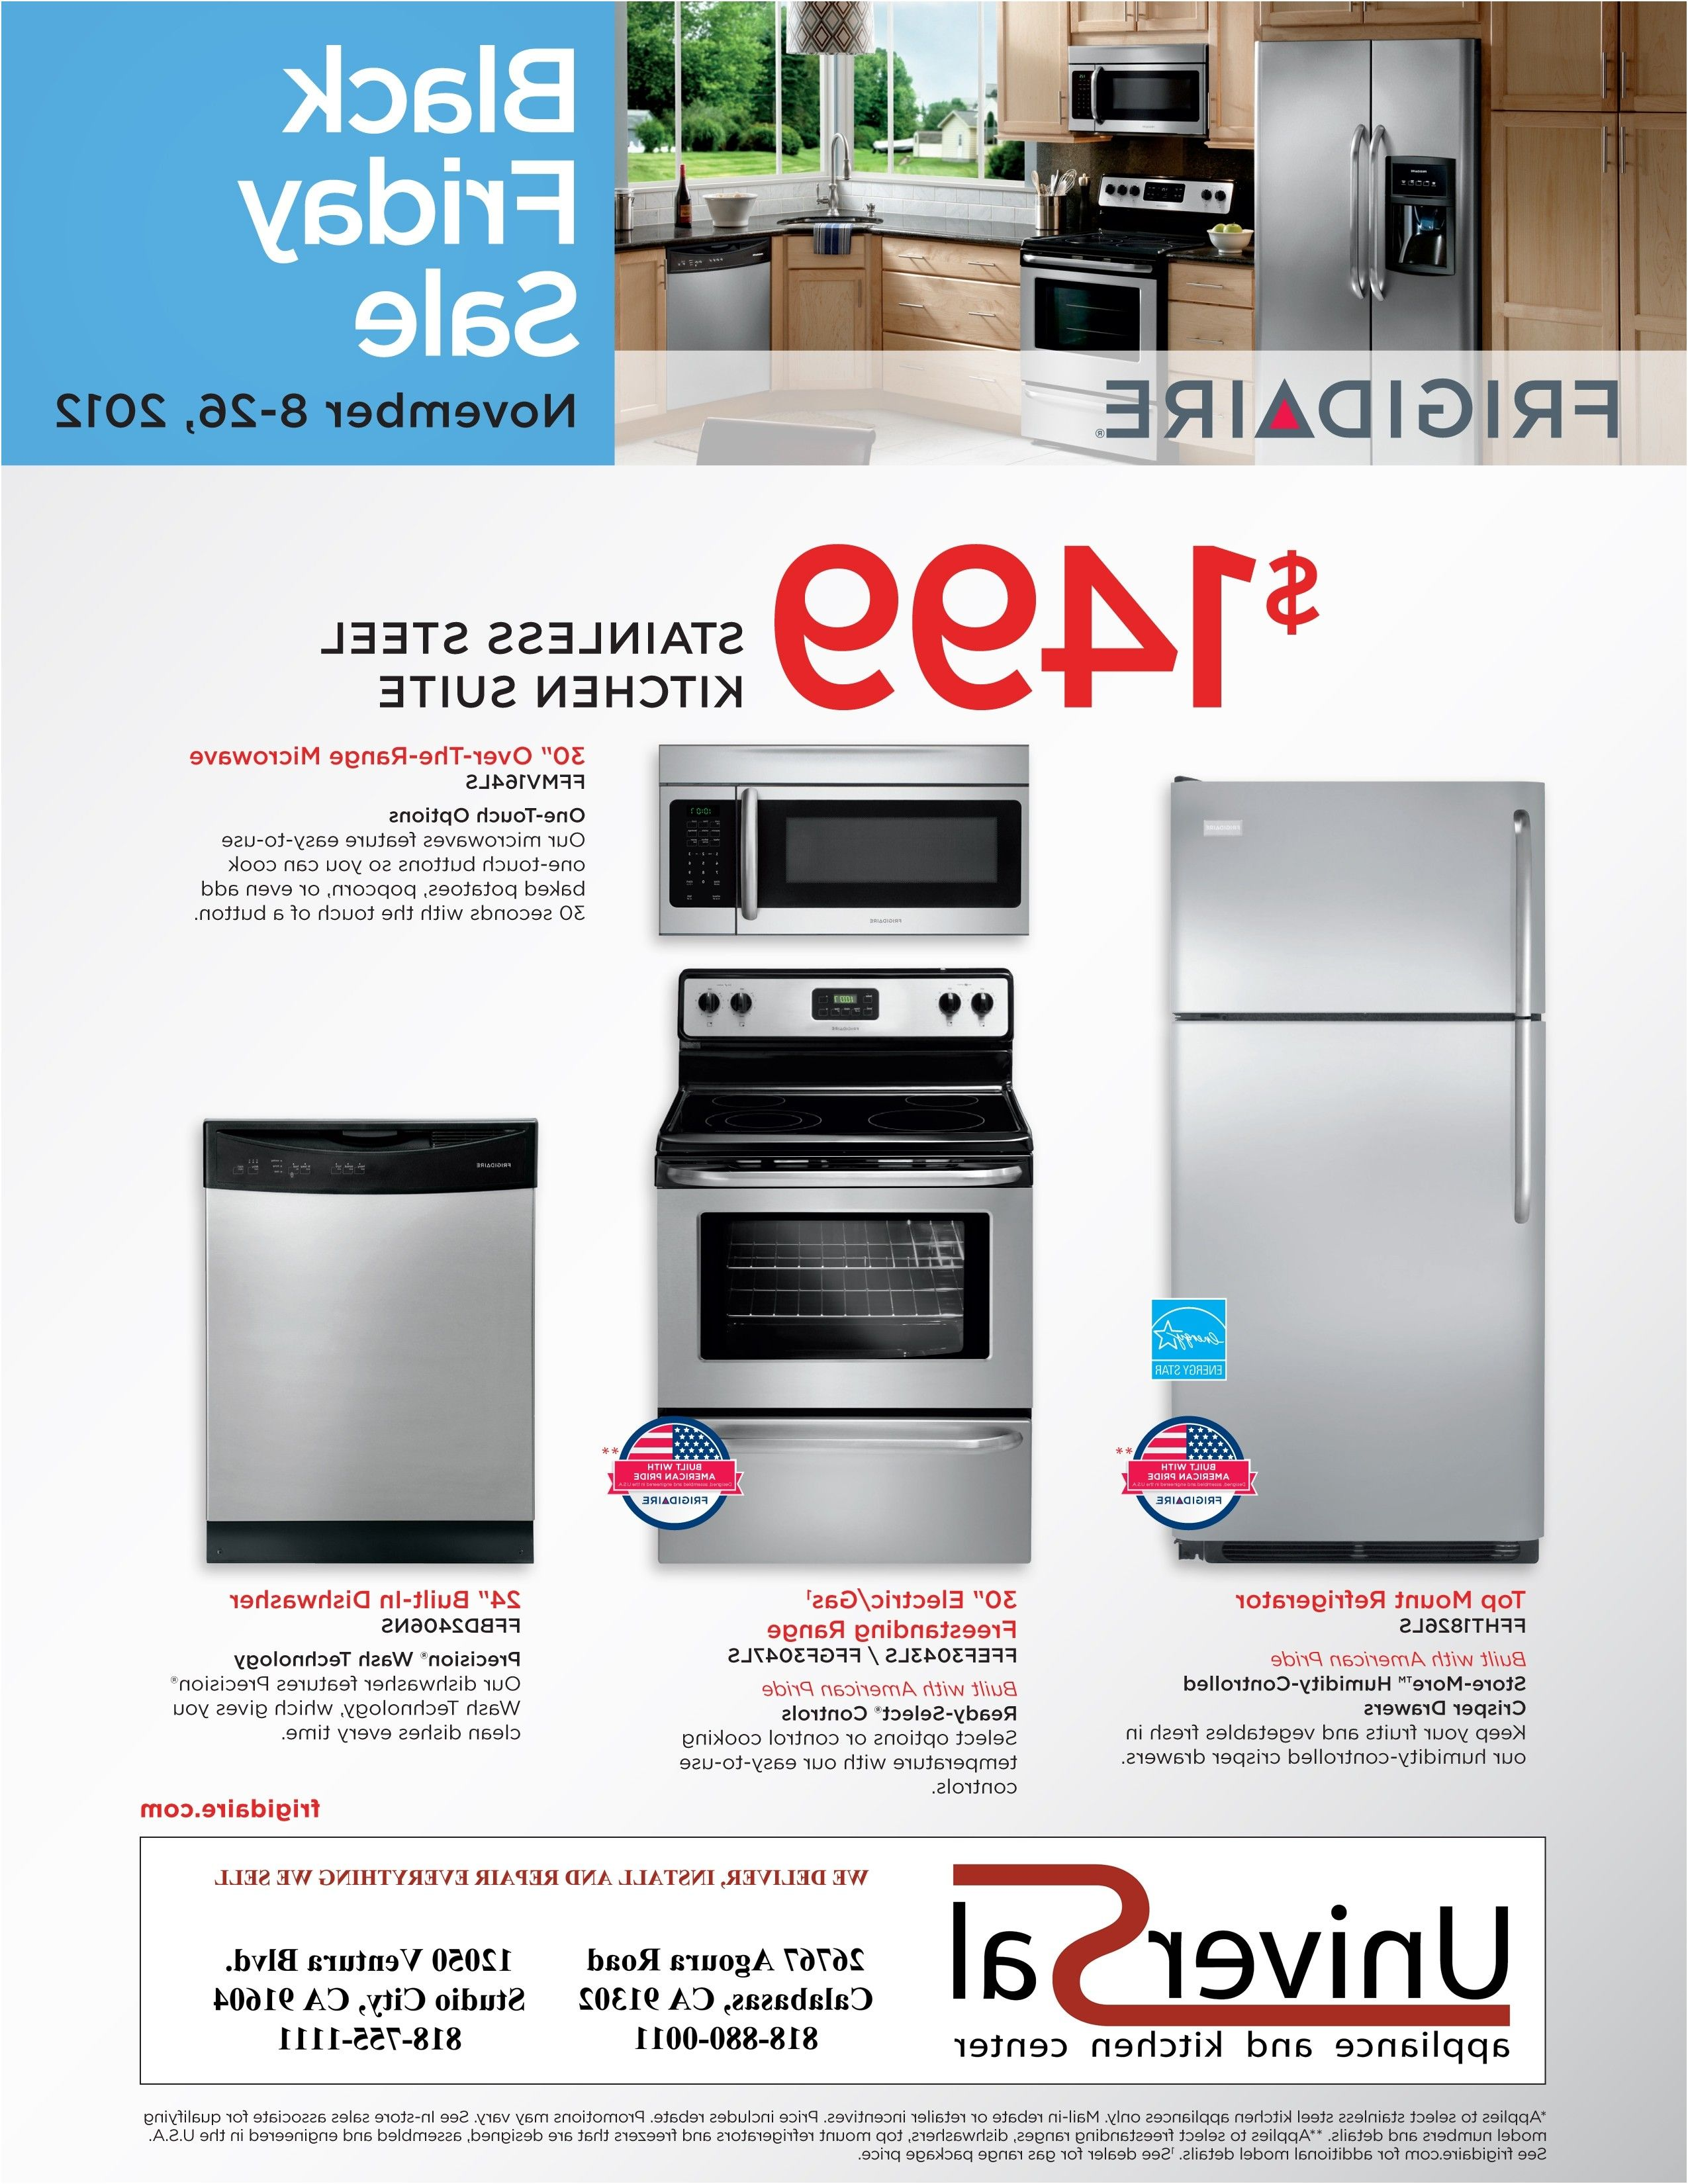 lowes kitchen aid grill top beautiful kitchenaid appliance package deals bundles from bundle sale